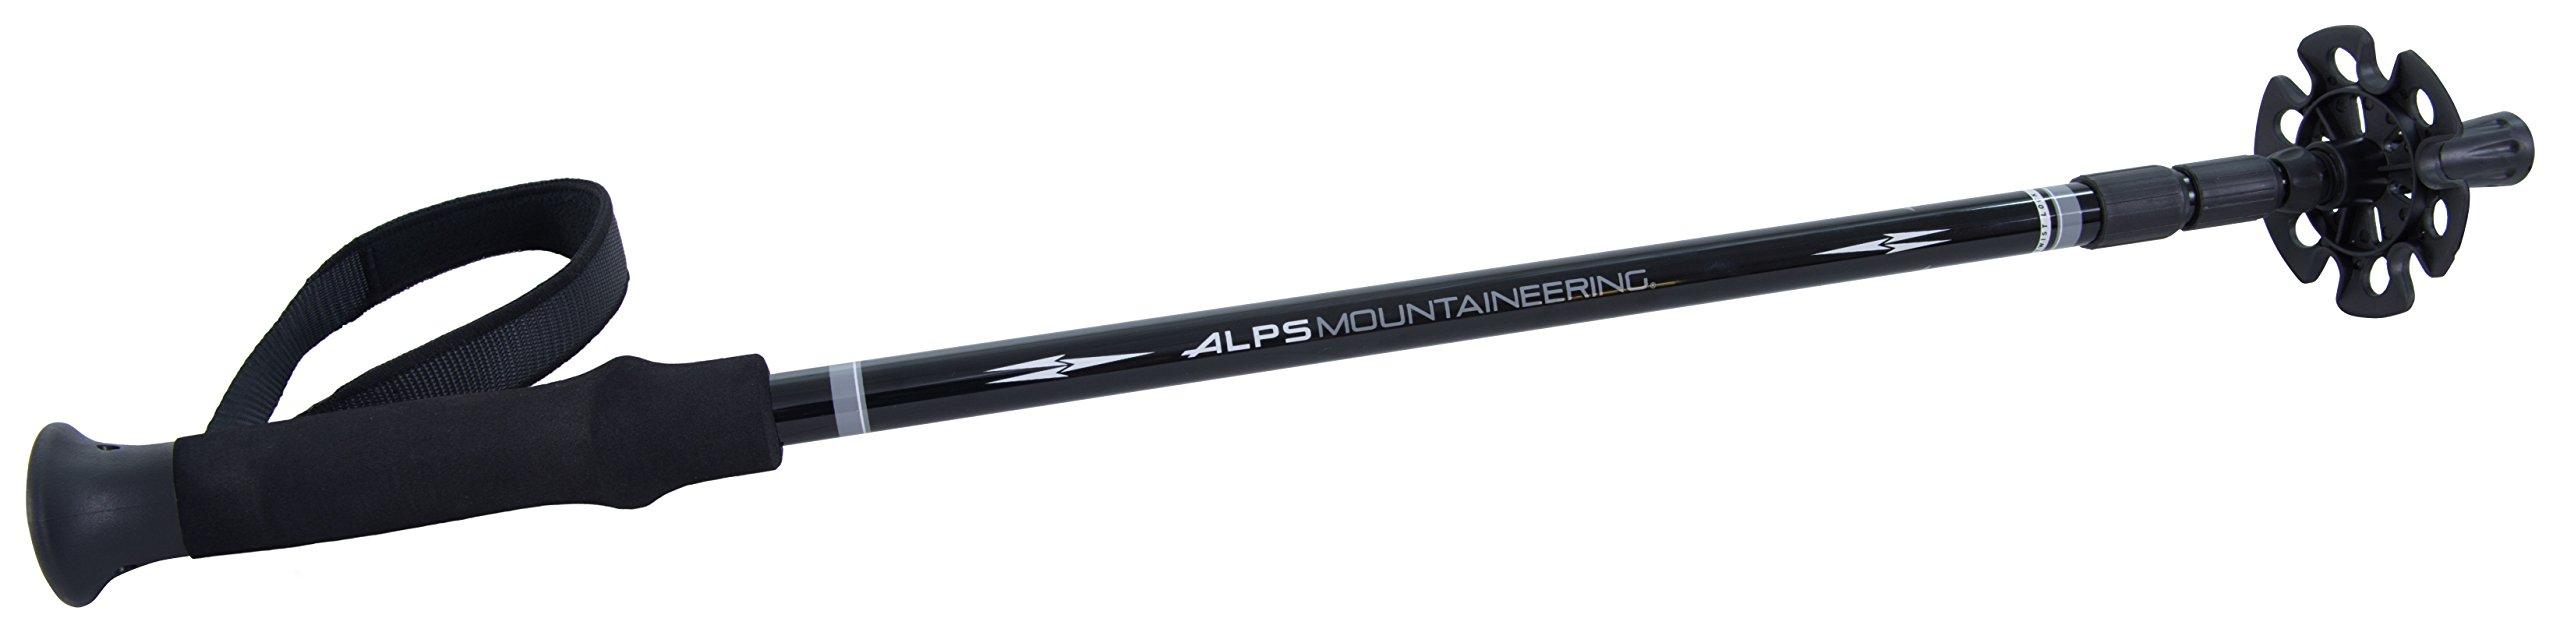 ALPS Mountaineering Explorer Trekking Pole by ALPS Mountaineering